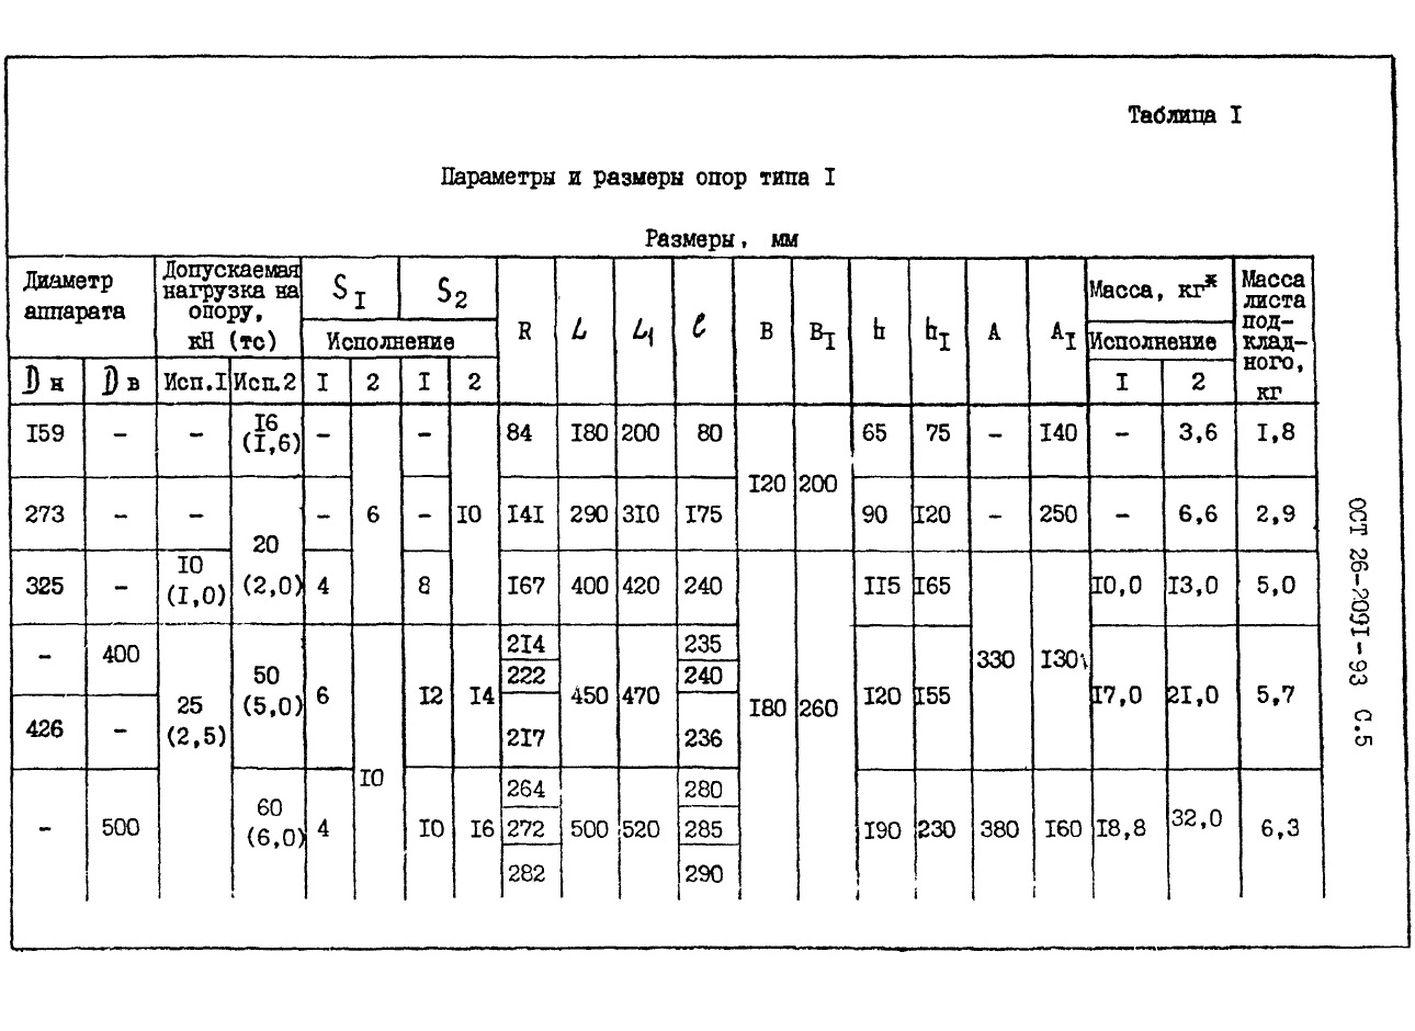 Опоры тип 1 ОСТ 26-2091-93 стр.3